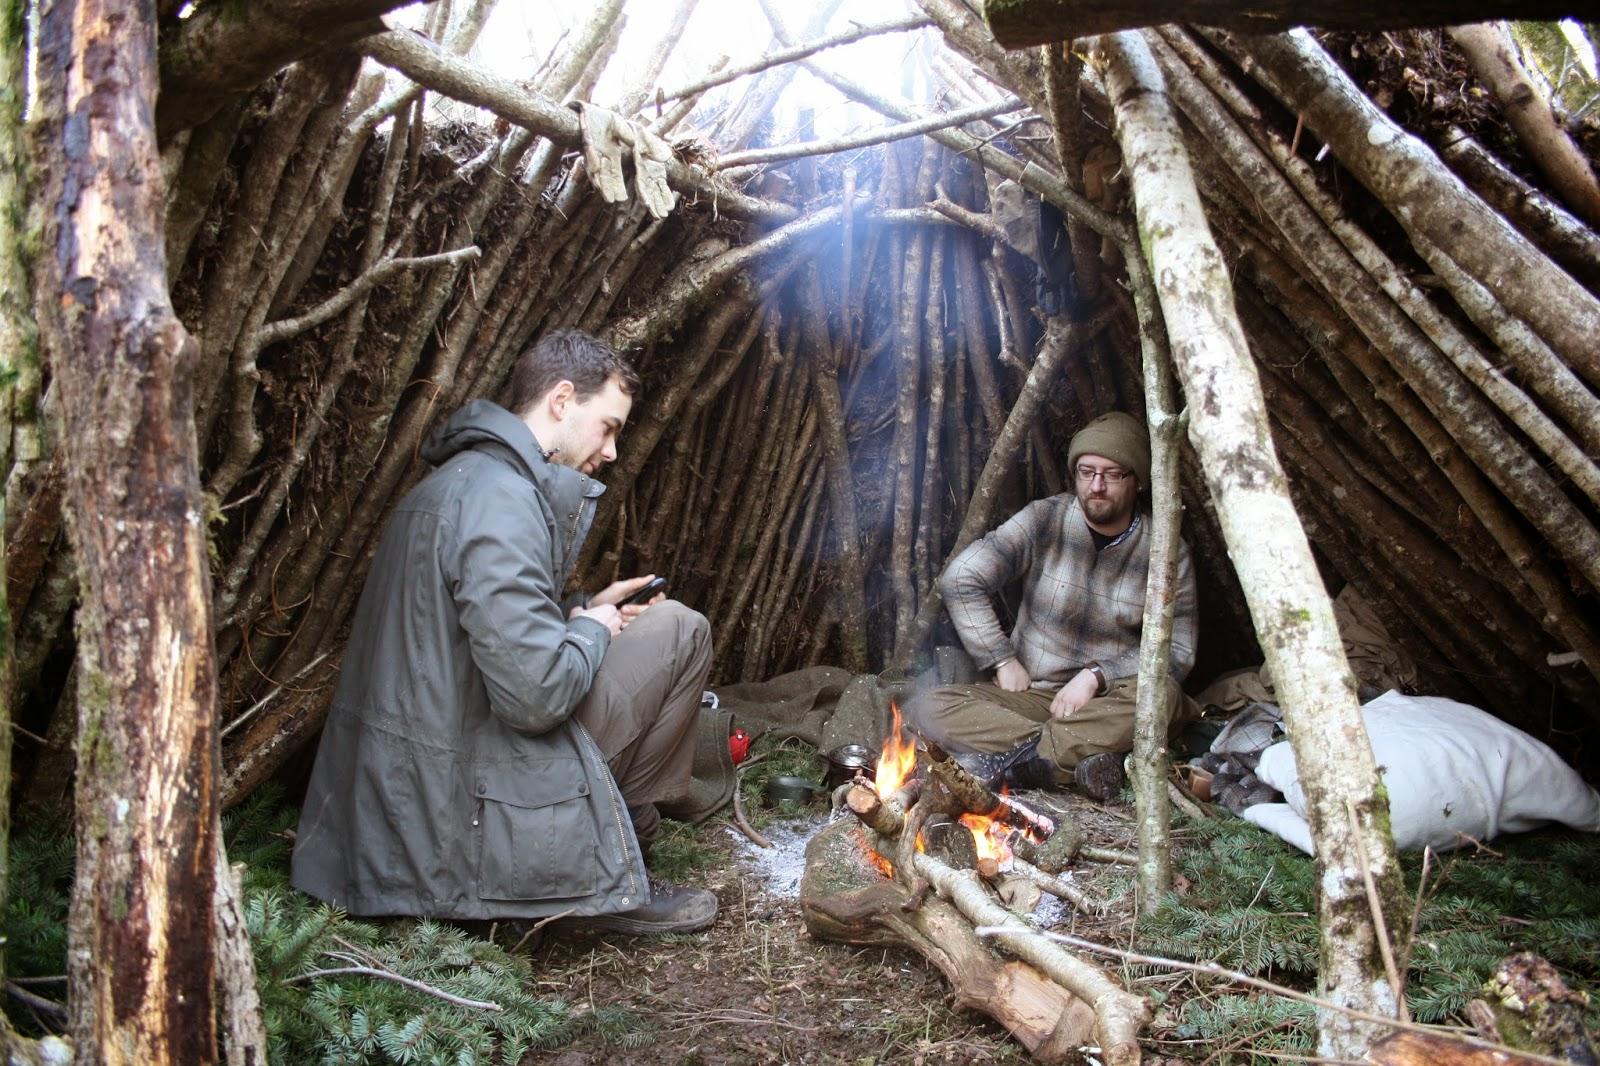 Wilderness Survival Skills And Bushcraft Antics The